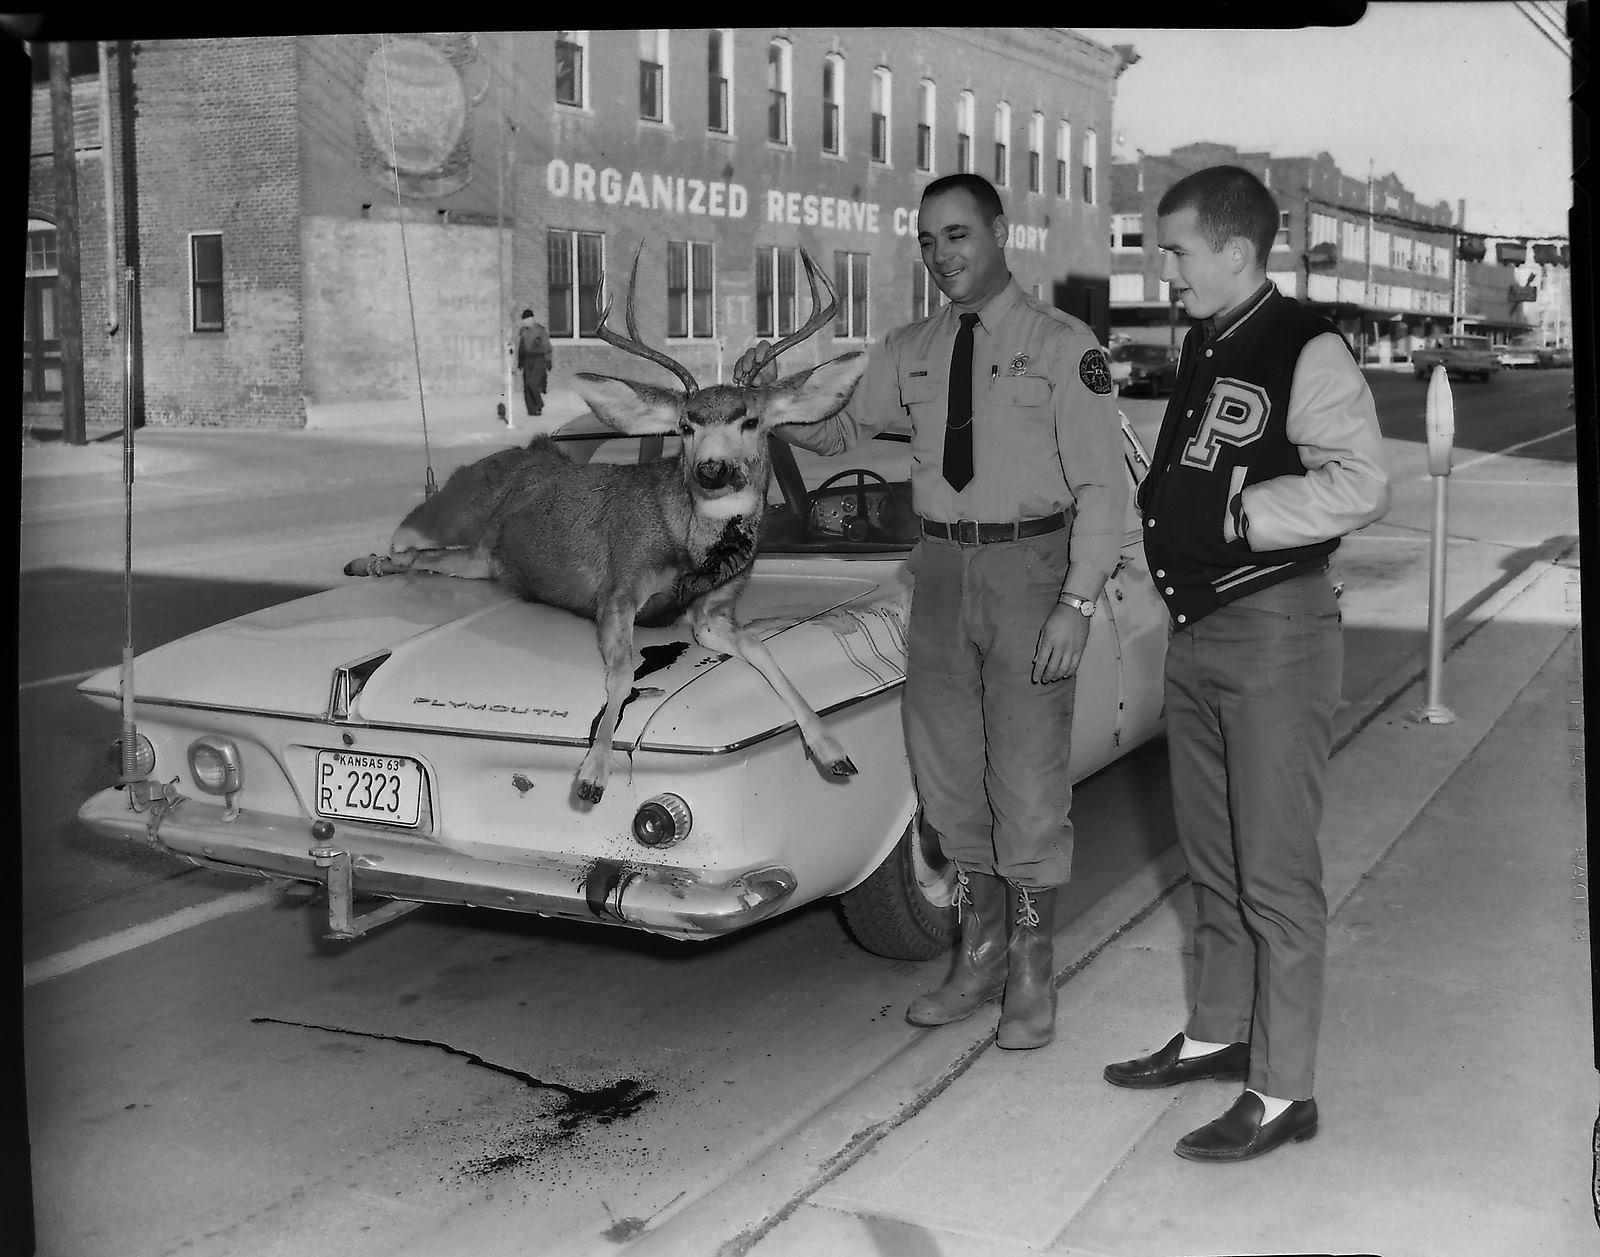 #97 TOMMY CRISPINO & JIM NICHOLS 1963 PARSONS, KS.